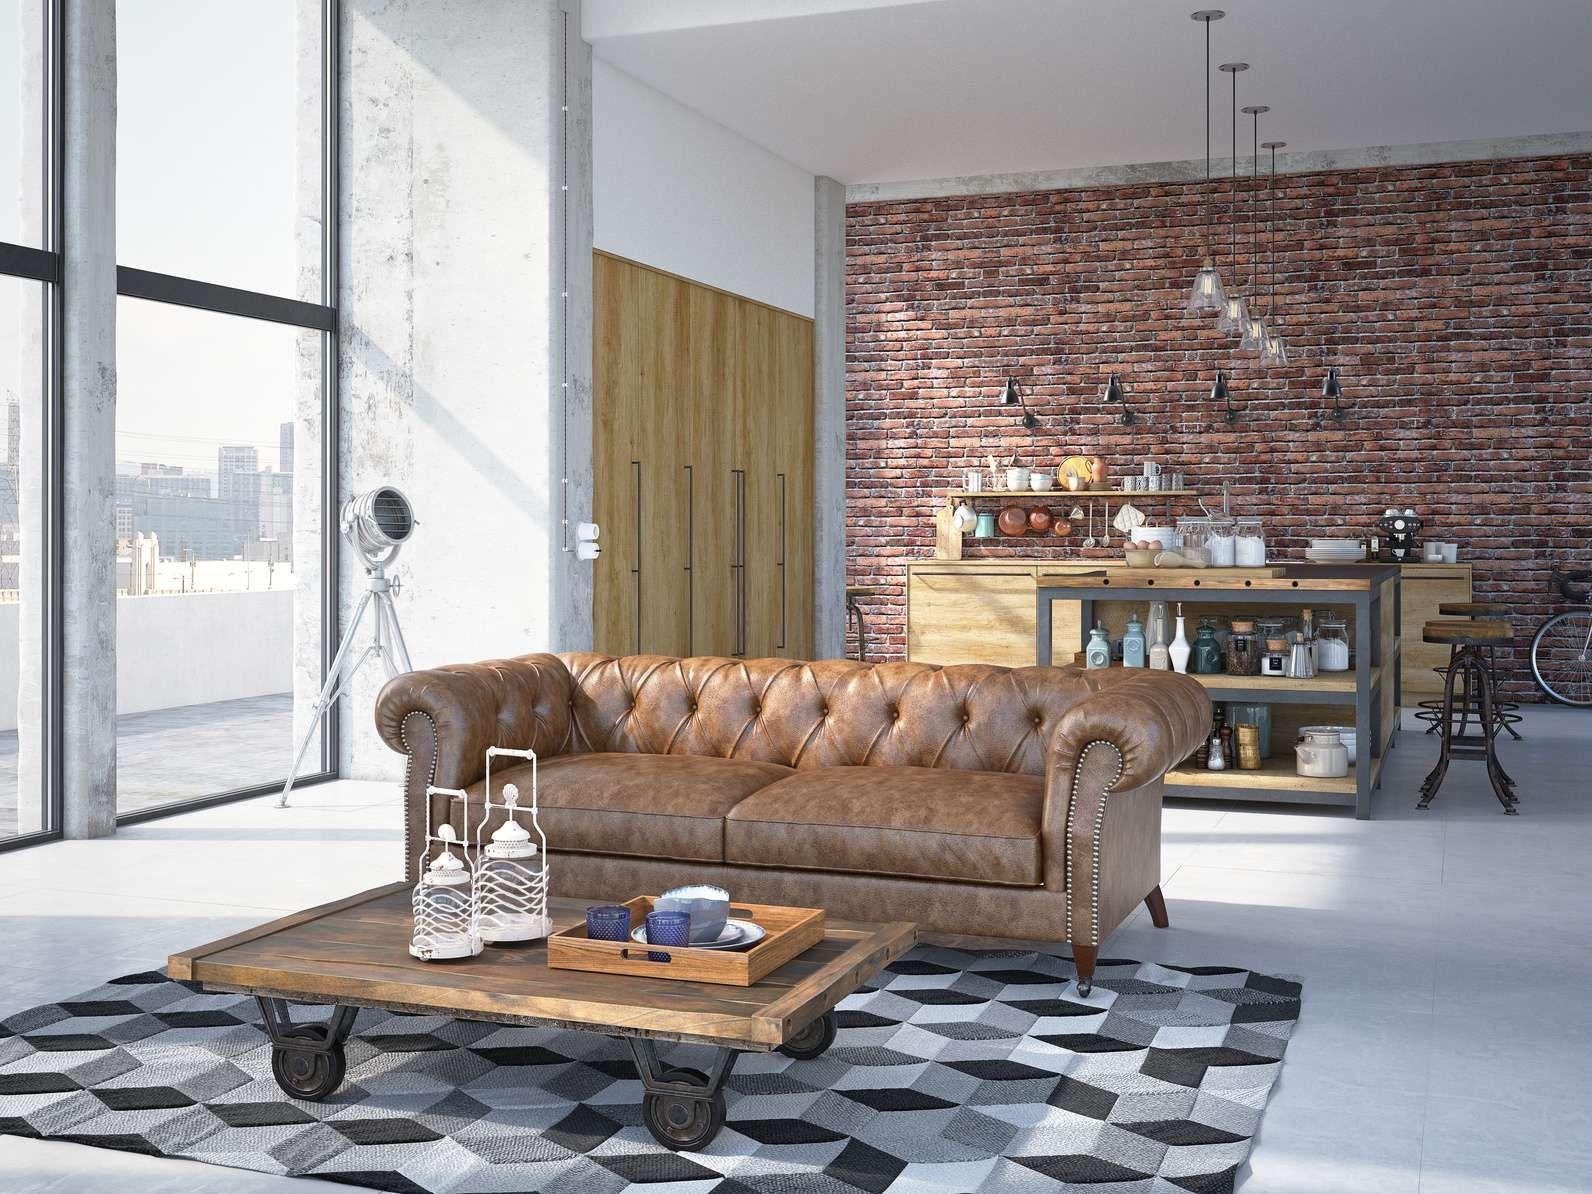 Indoortrend Trend Möbel (mit Bildern) Industrial möbel